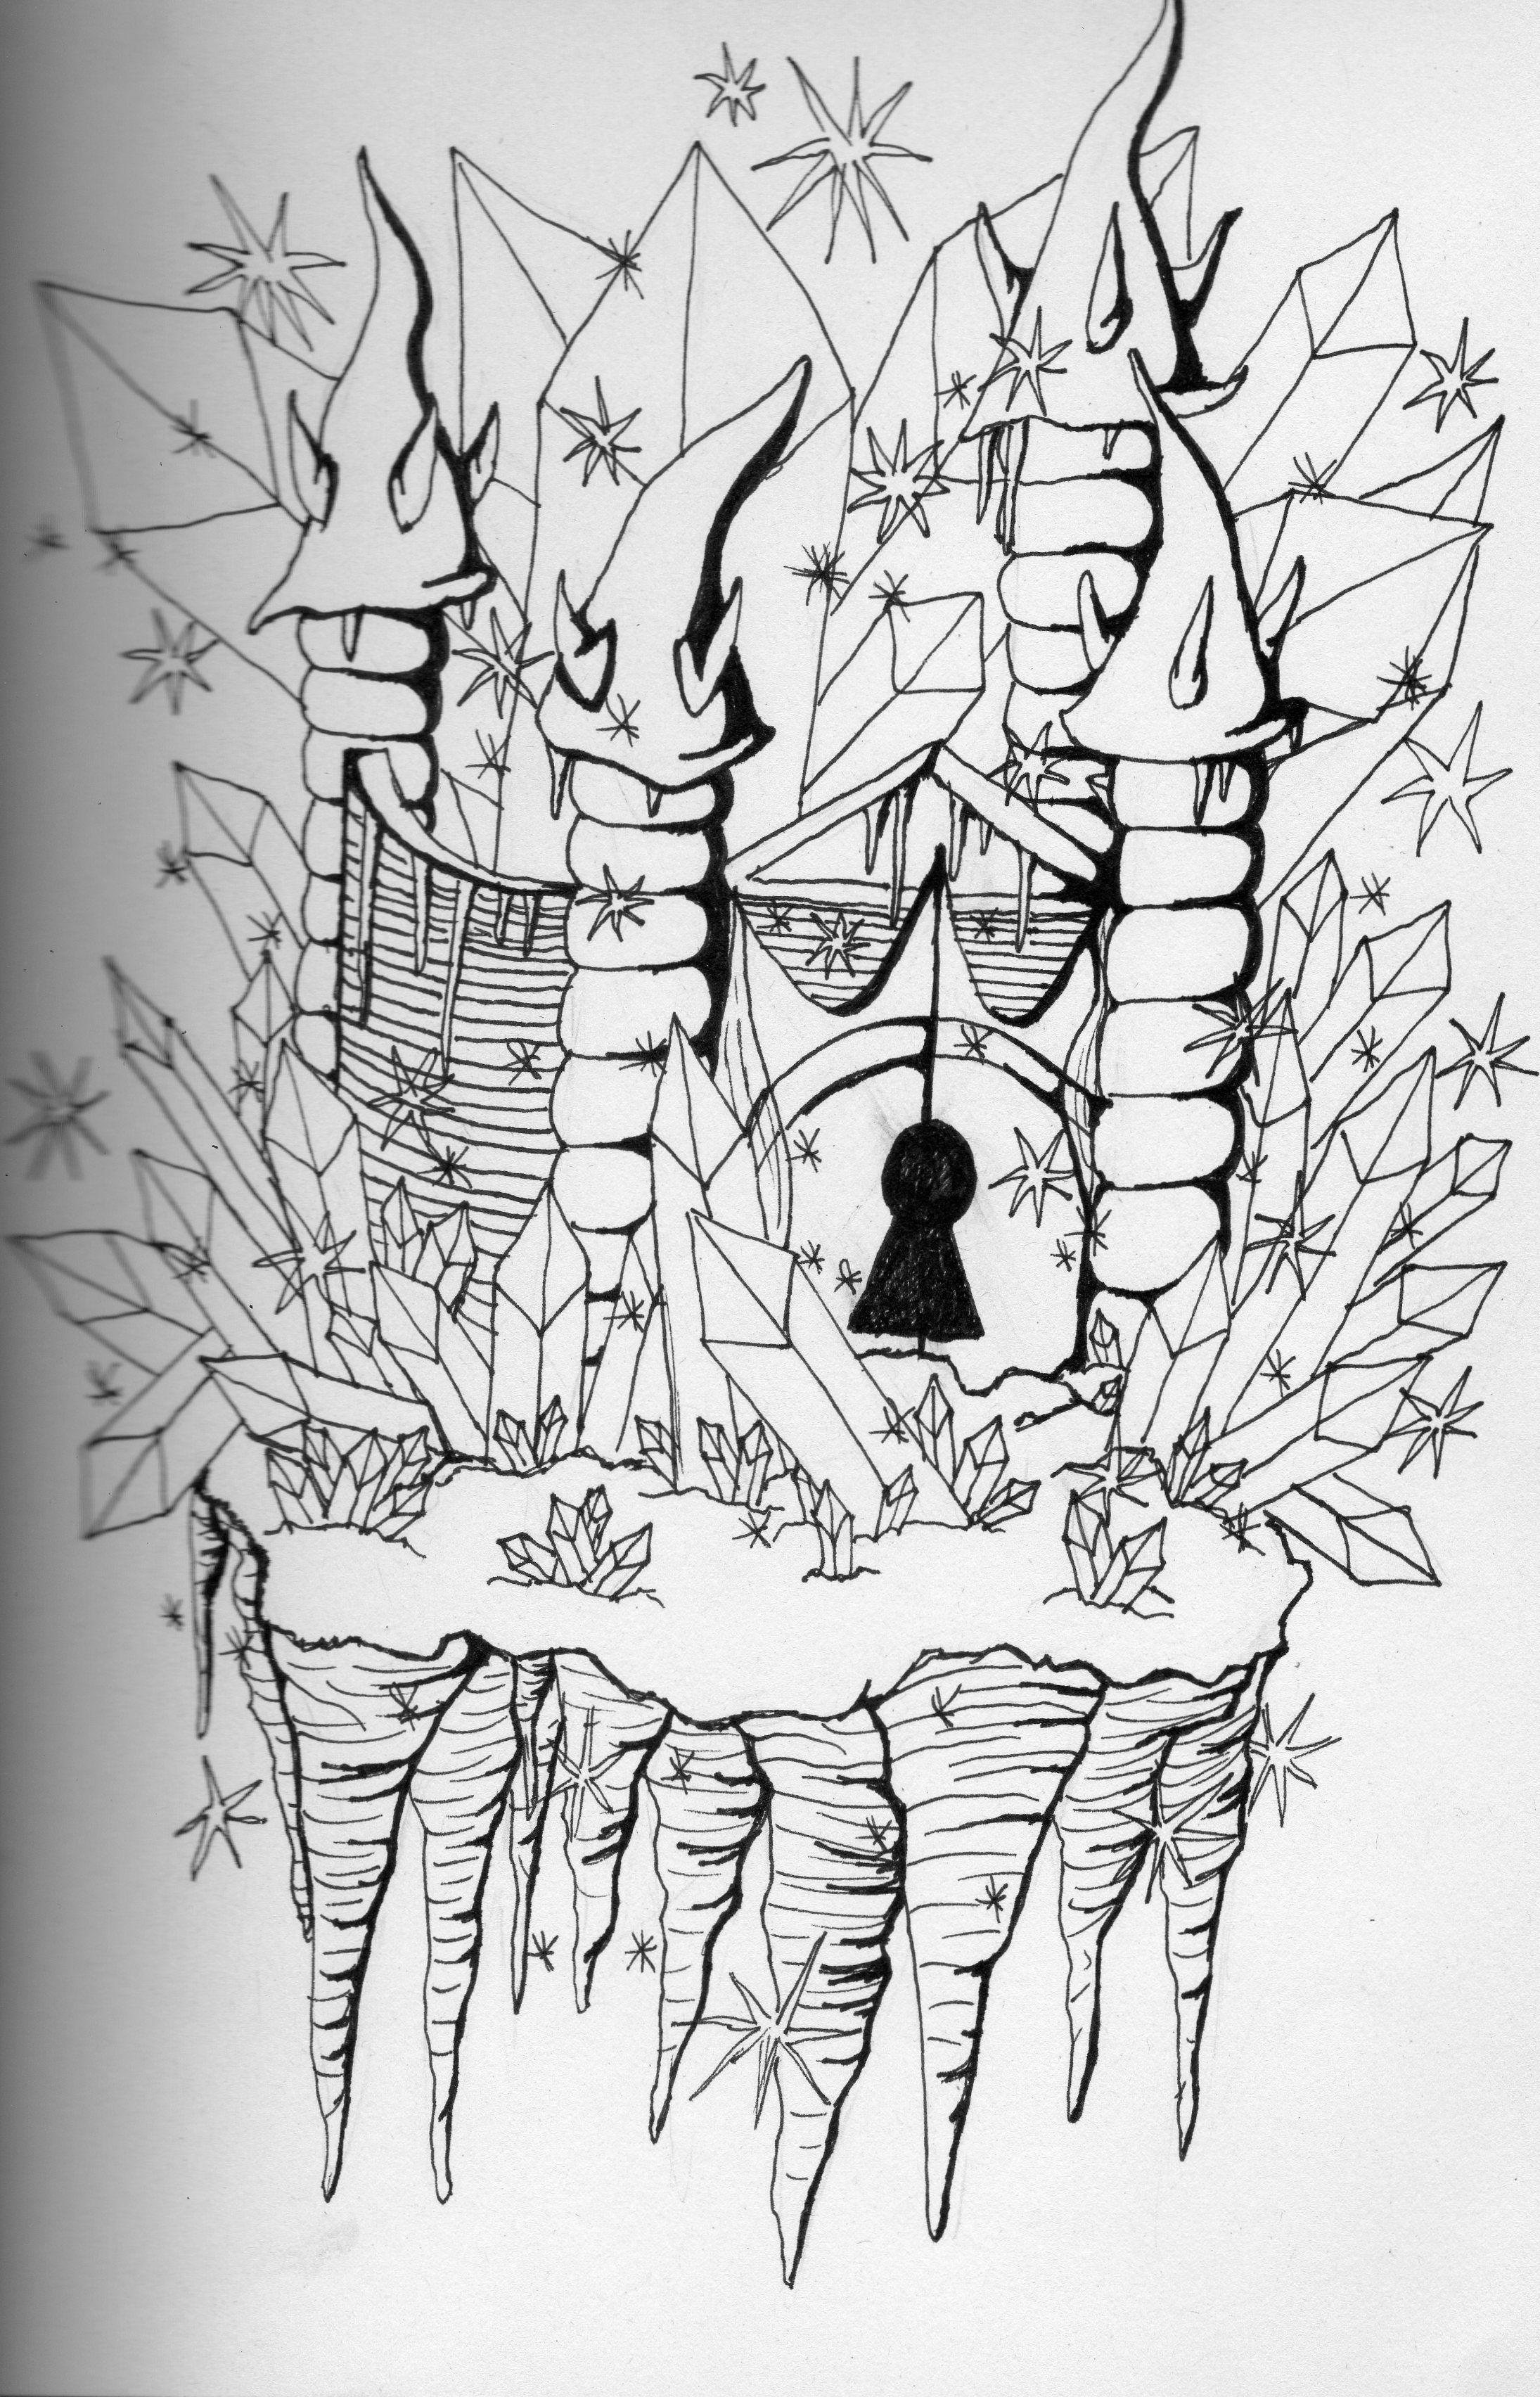 Ice Castle - Drawing | Art | Pinterest | Ice castles, Castle Drawing ...